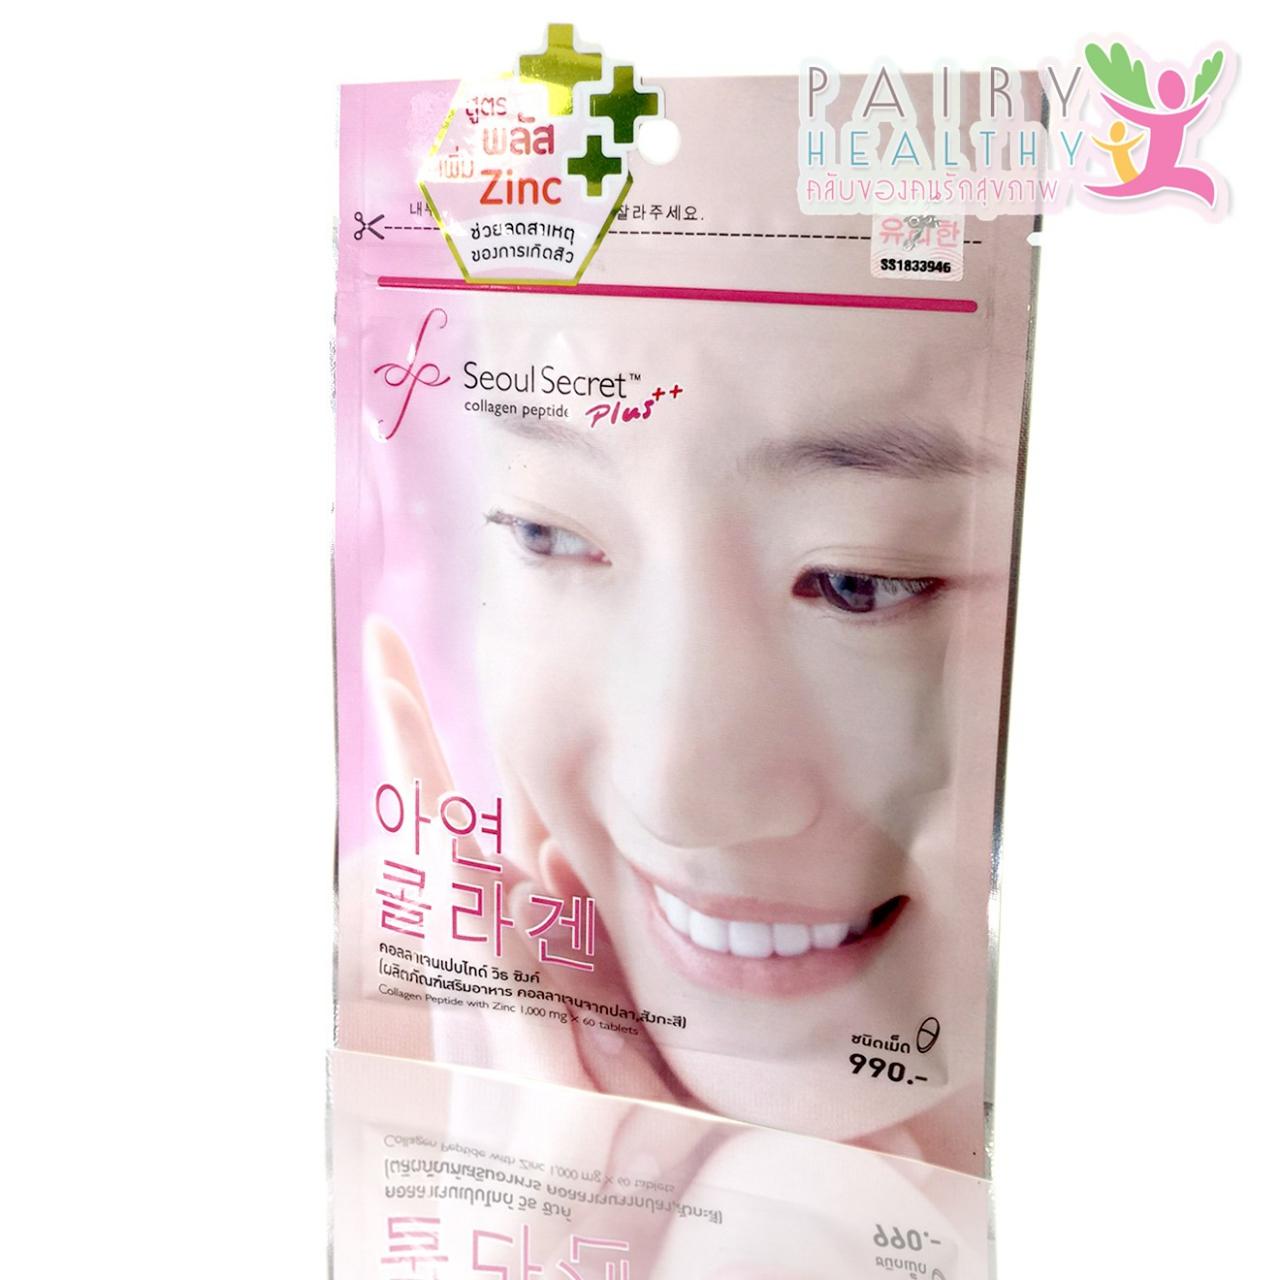 Seoul Secret Collagen Plus++Zinc 60 tablet โซล ซีเคลท คอลลาเจน พลัส ซิงค์ 60 เม็ด ส่งฟรี ลทบ.